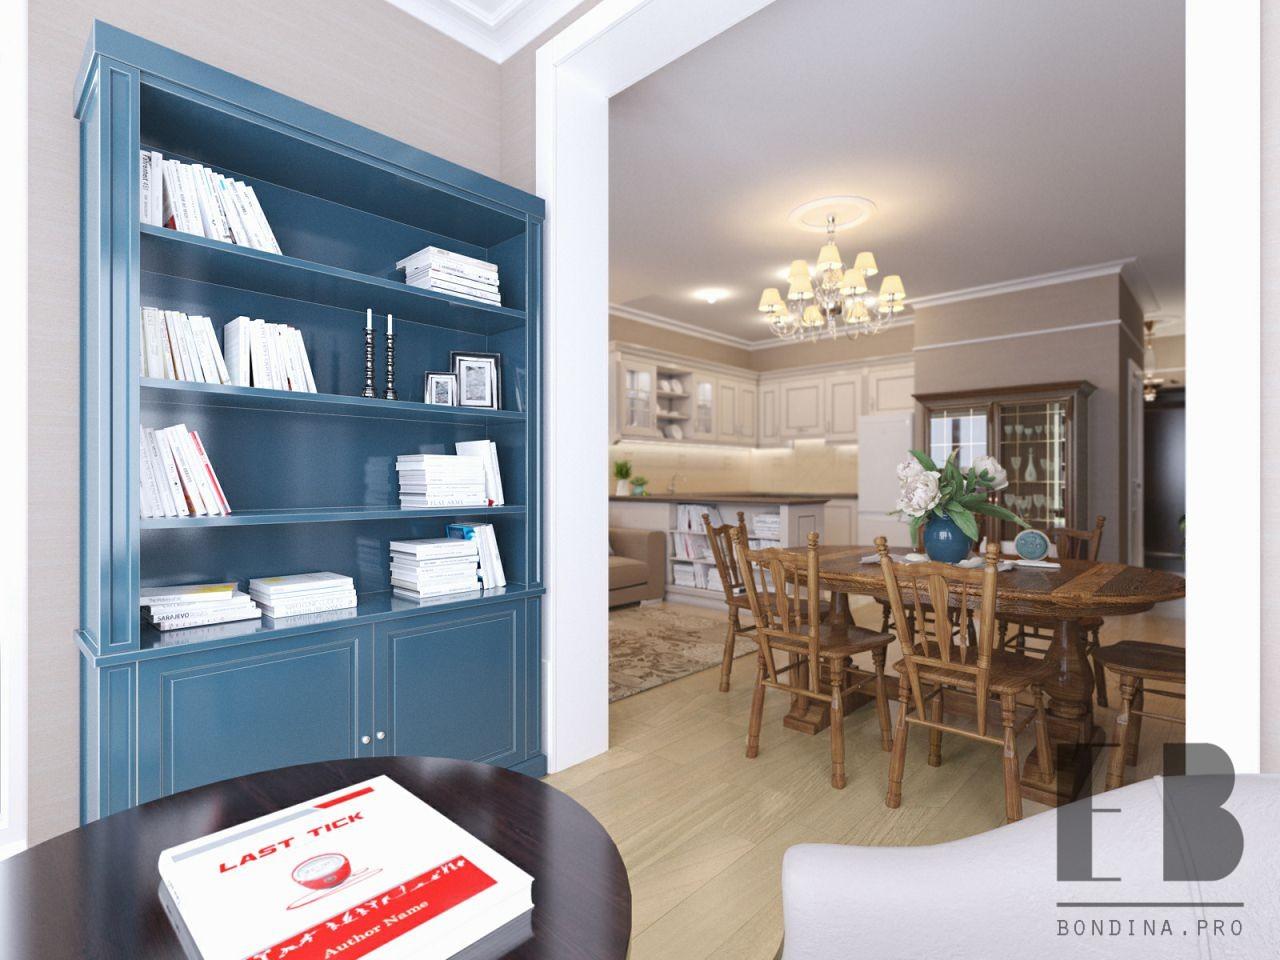 Bookcase in the living room interior design